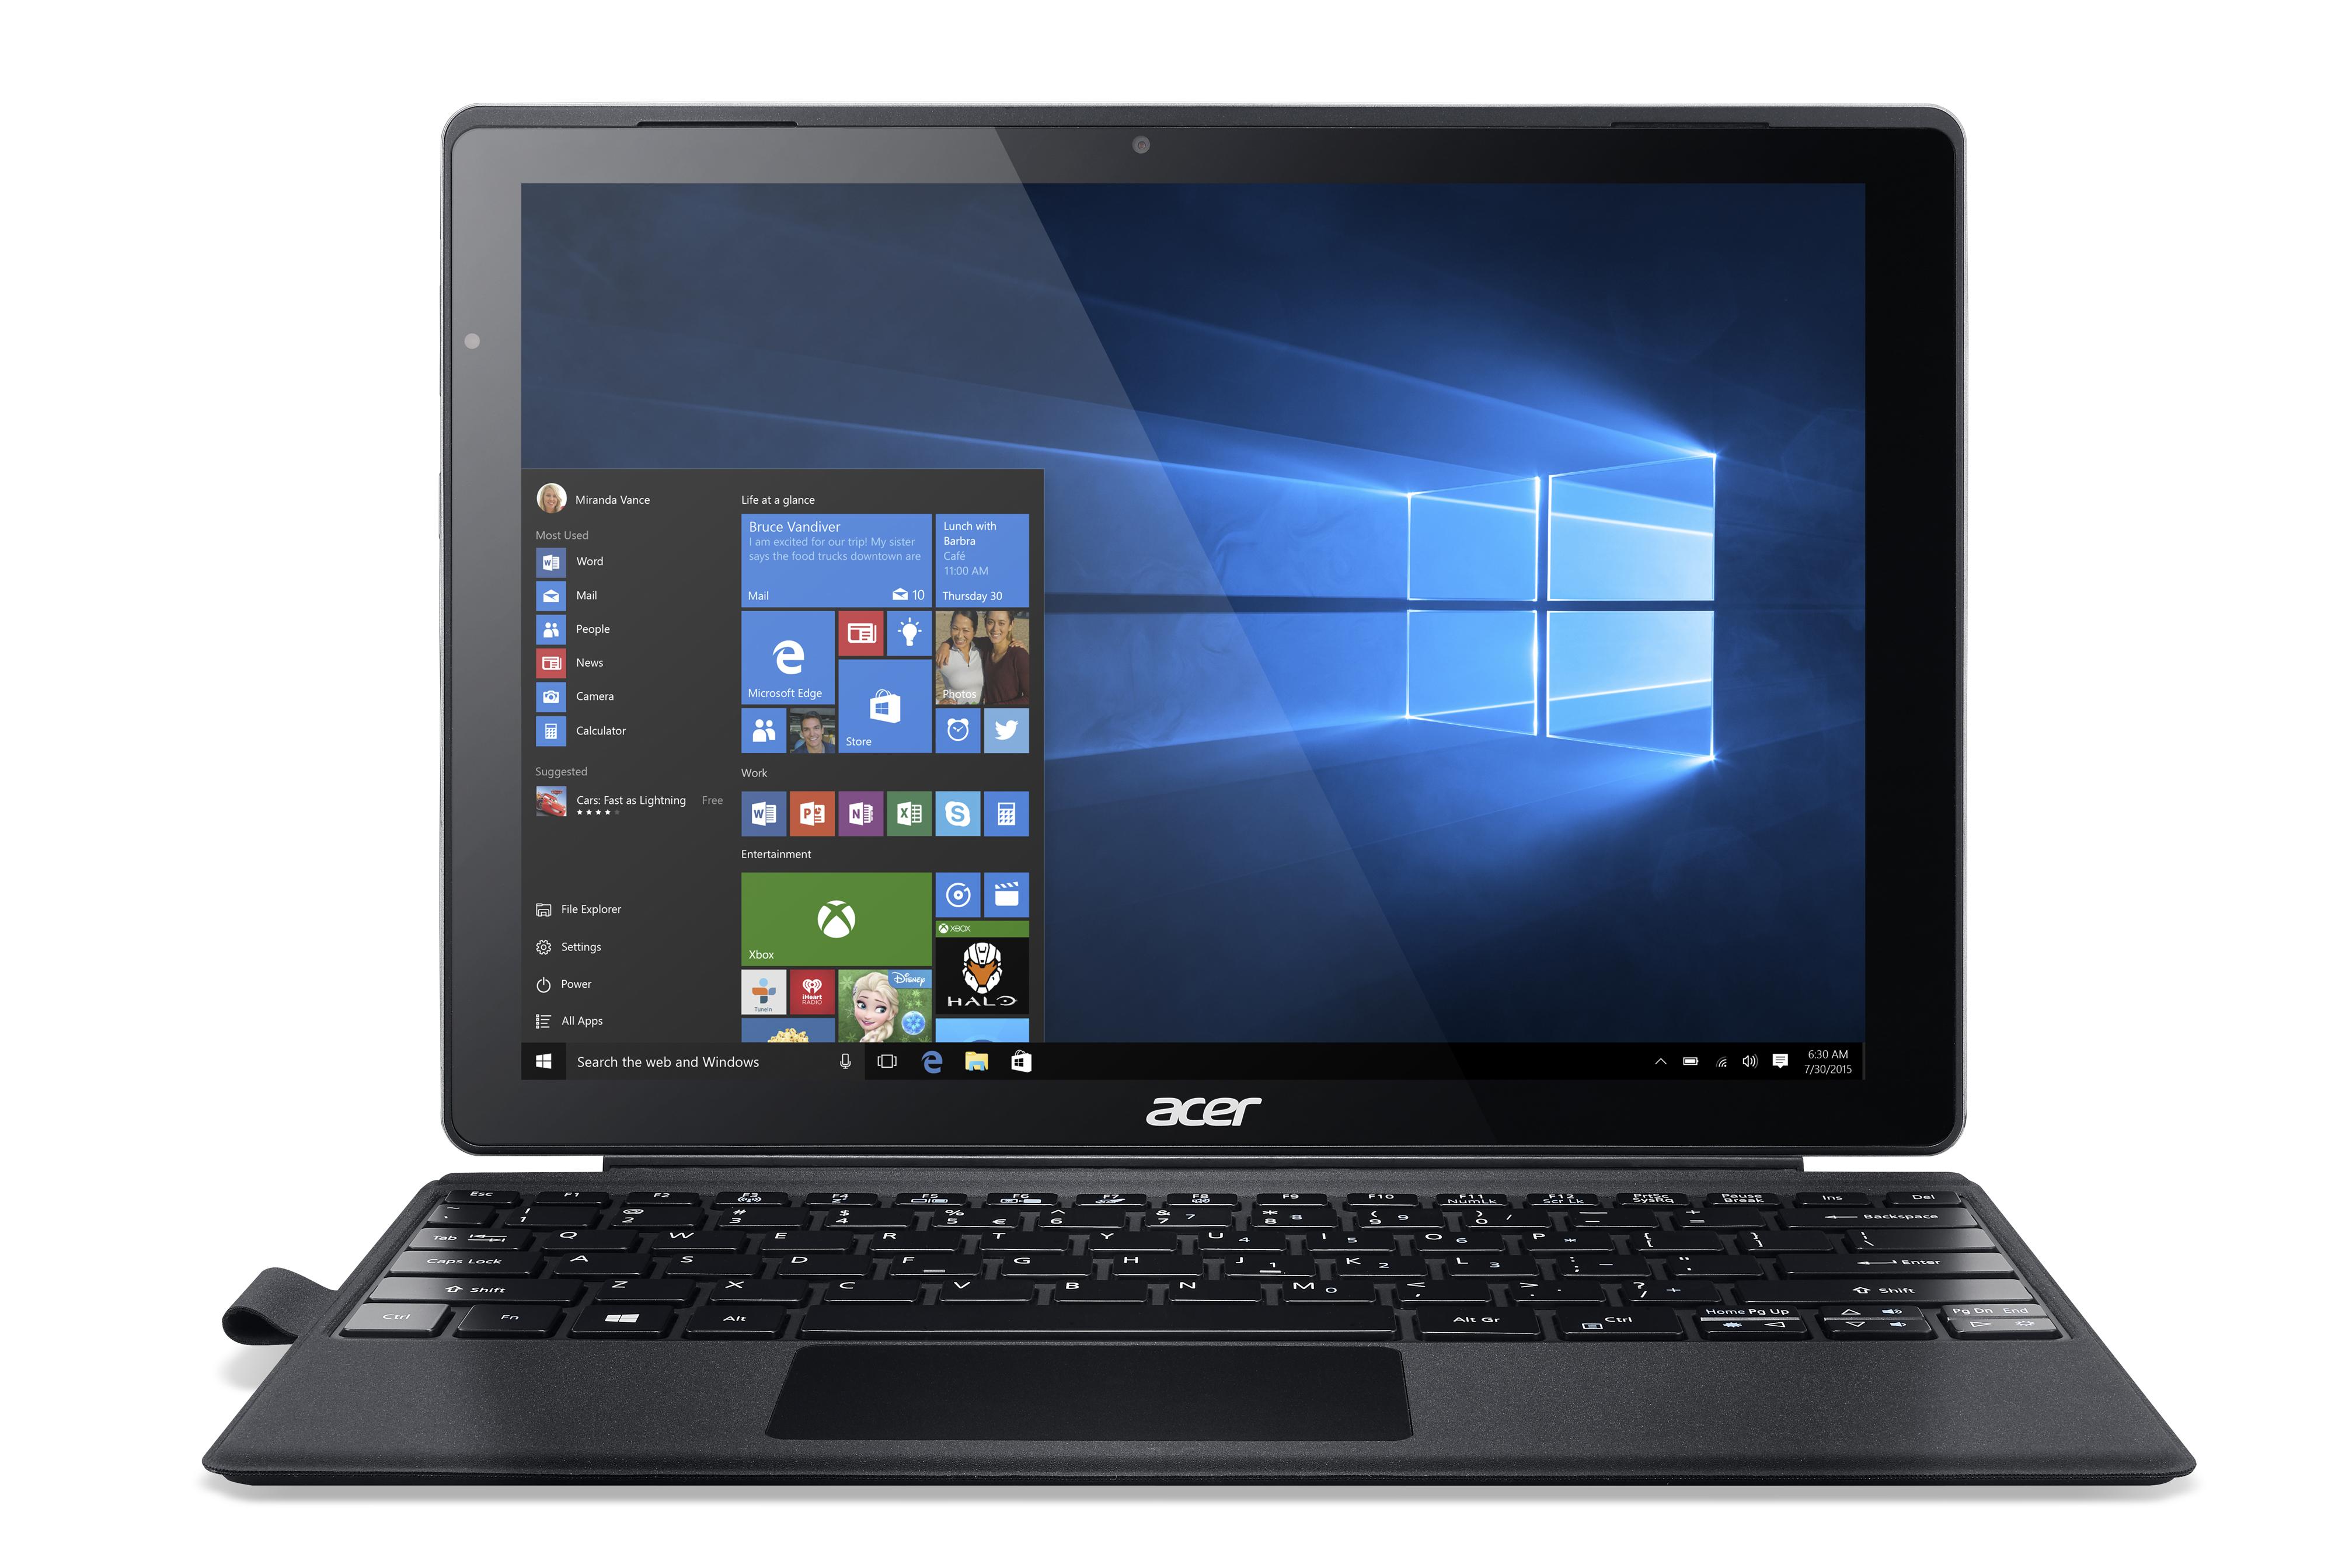 Acer Aspire 12-56RP 256 GB Silber, Schwarz - 12 Tablet - Core i5 Mobile 2,3 GHz 30,5cm-Display